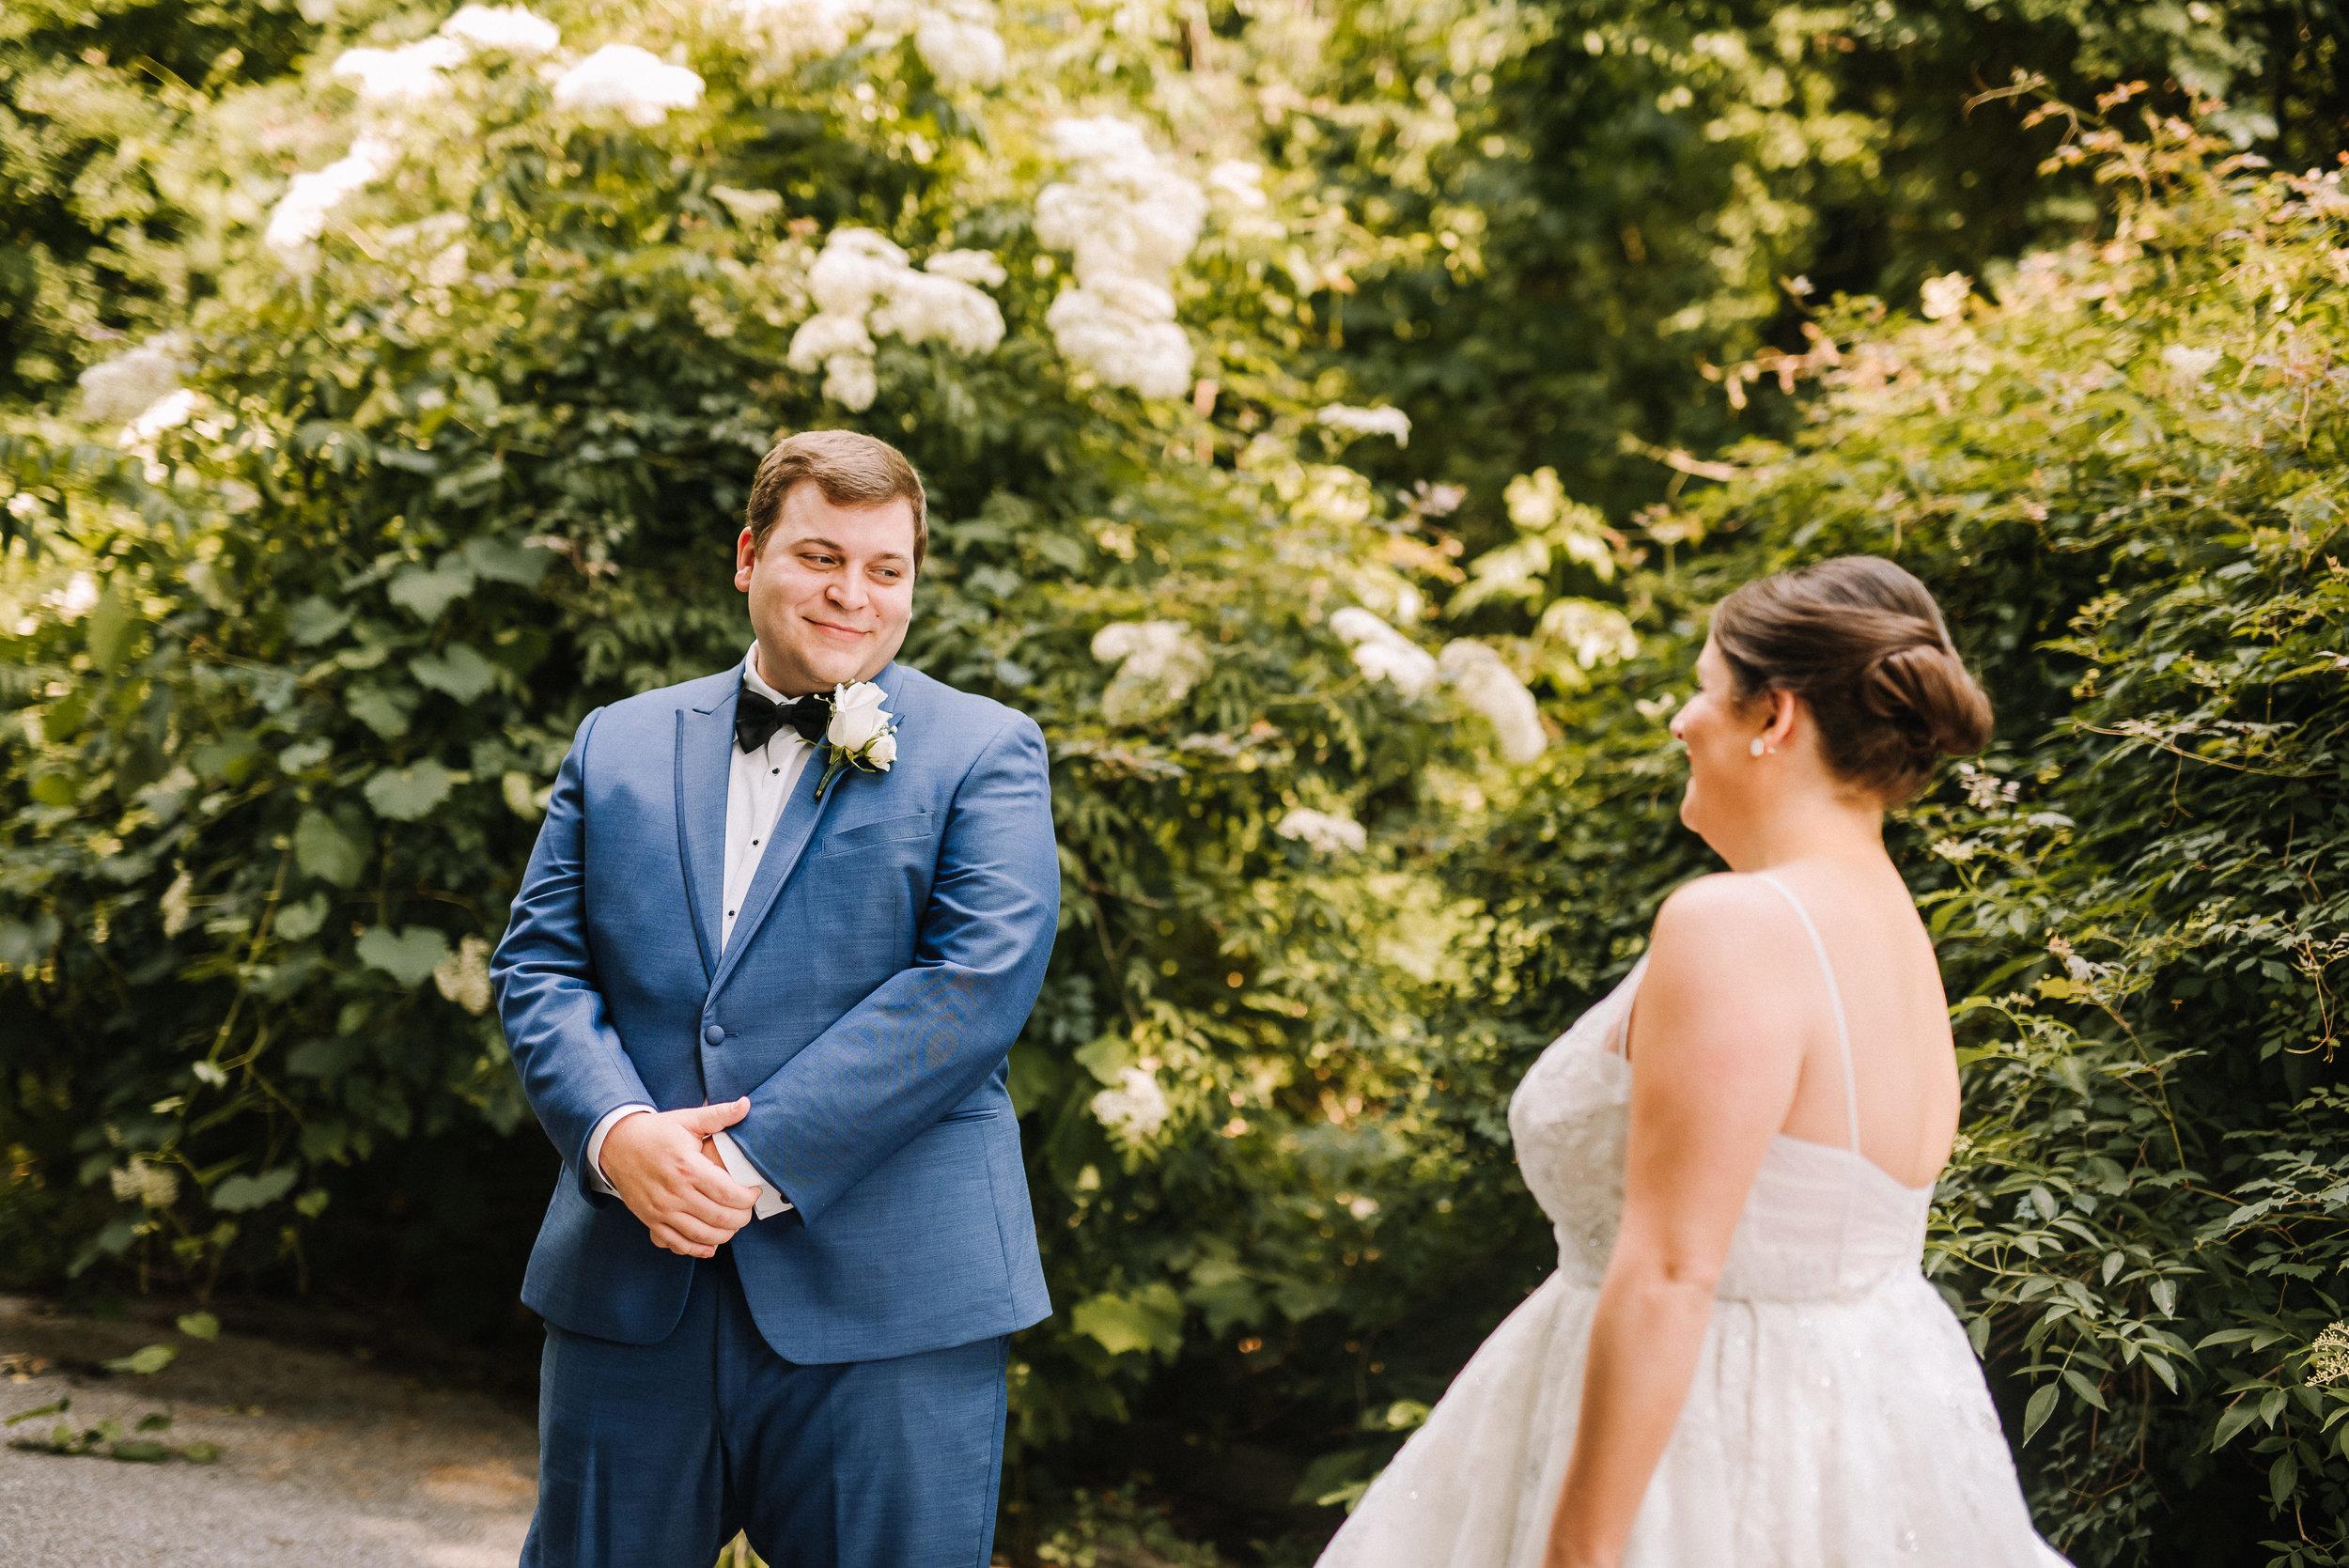 Smith Wedding_Memphis Zoo_Ashley Benham Photography-165.jpg